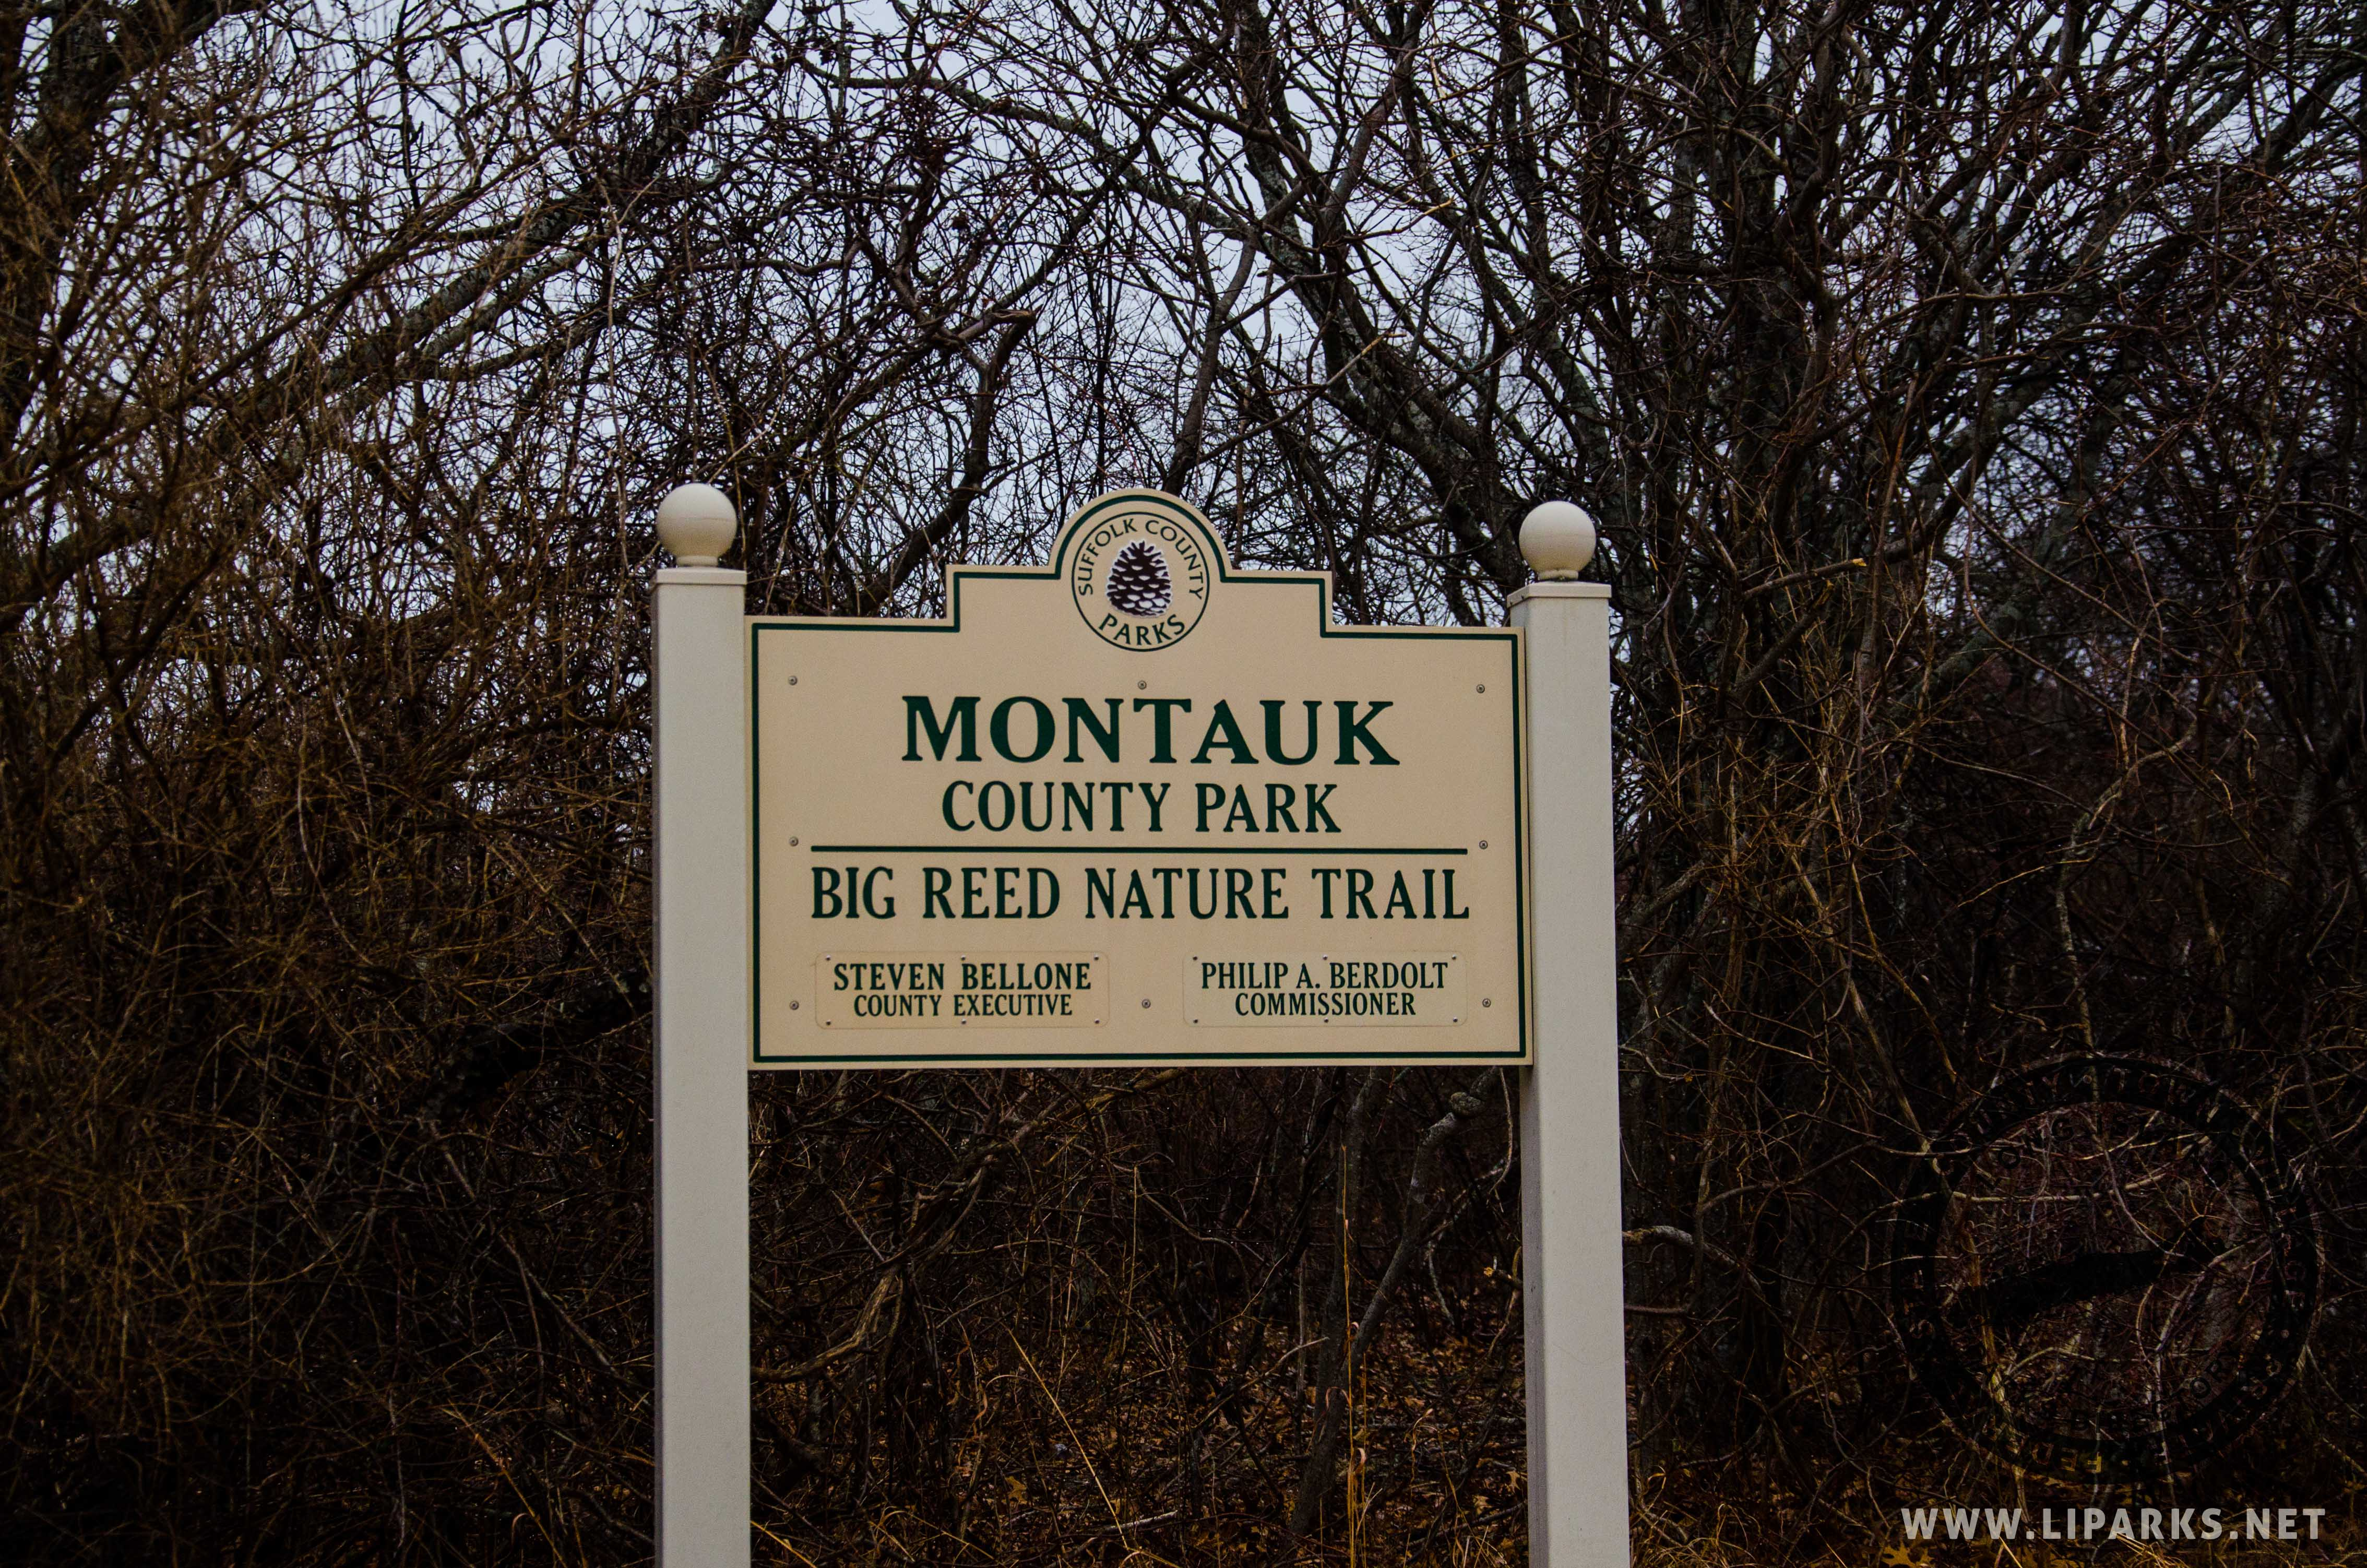 Montauk County Park